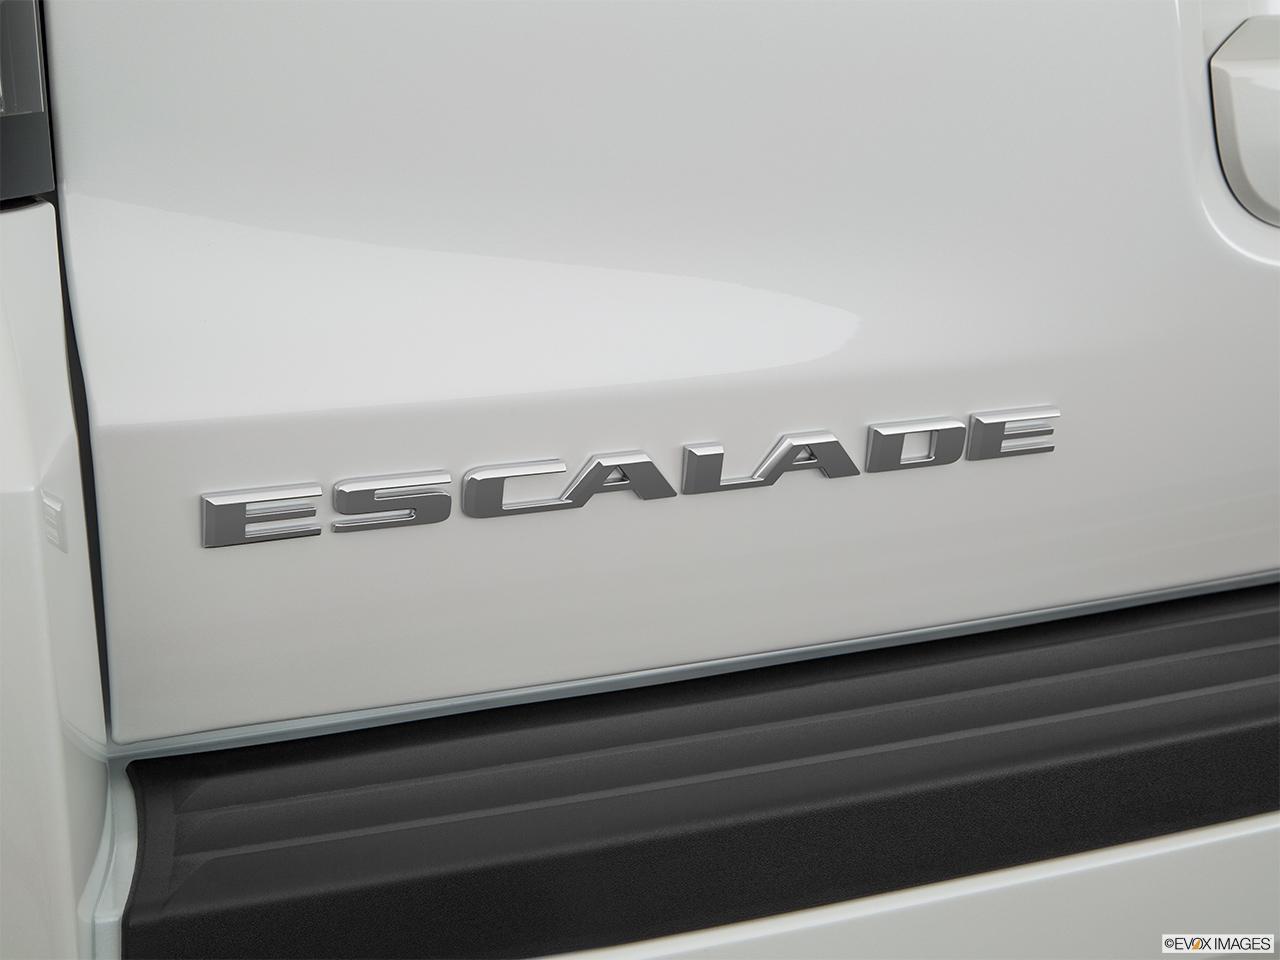 Car Pictures List for Cadillac Escalade 2017 6.2L Platinum ...